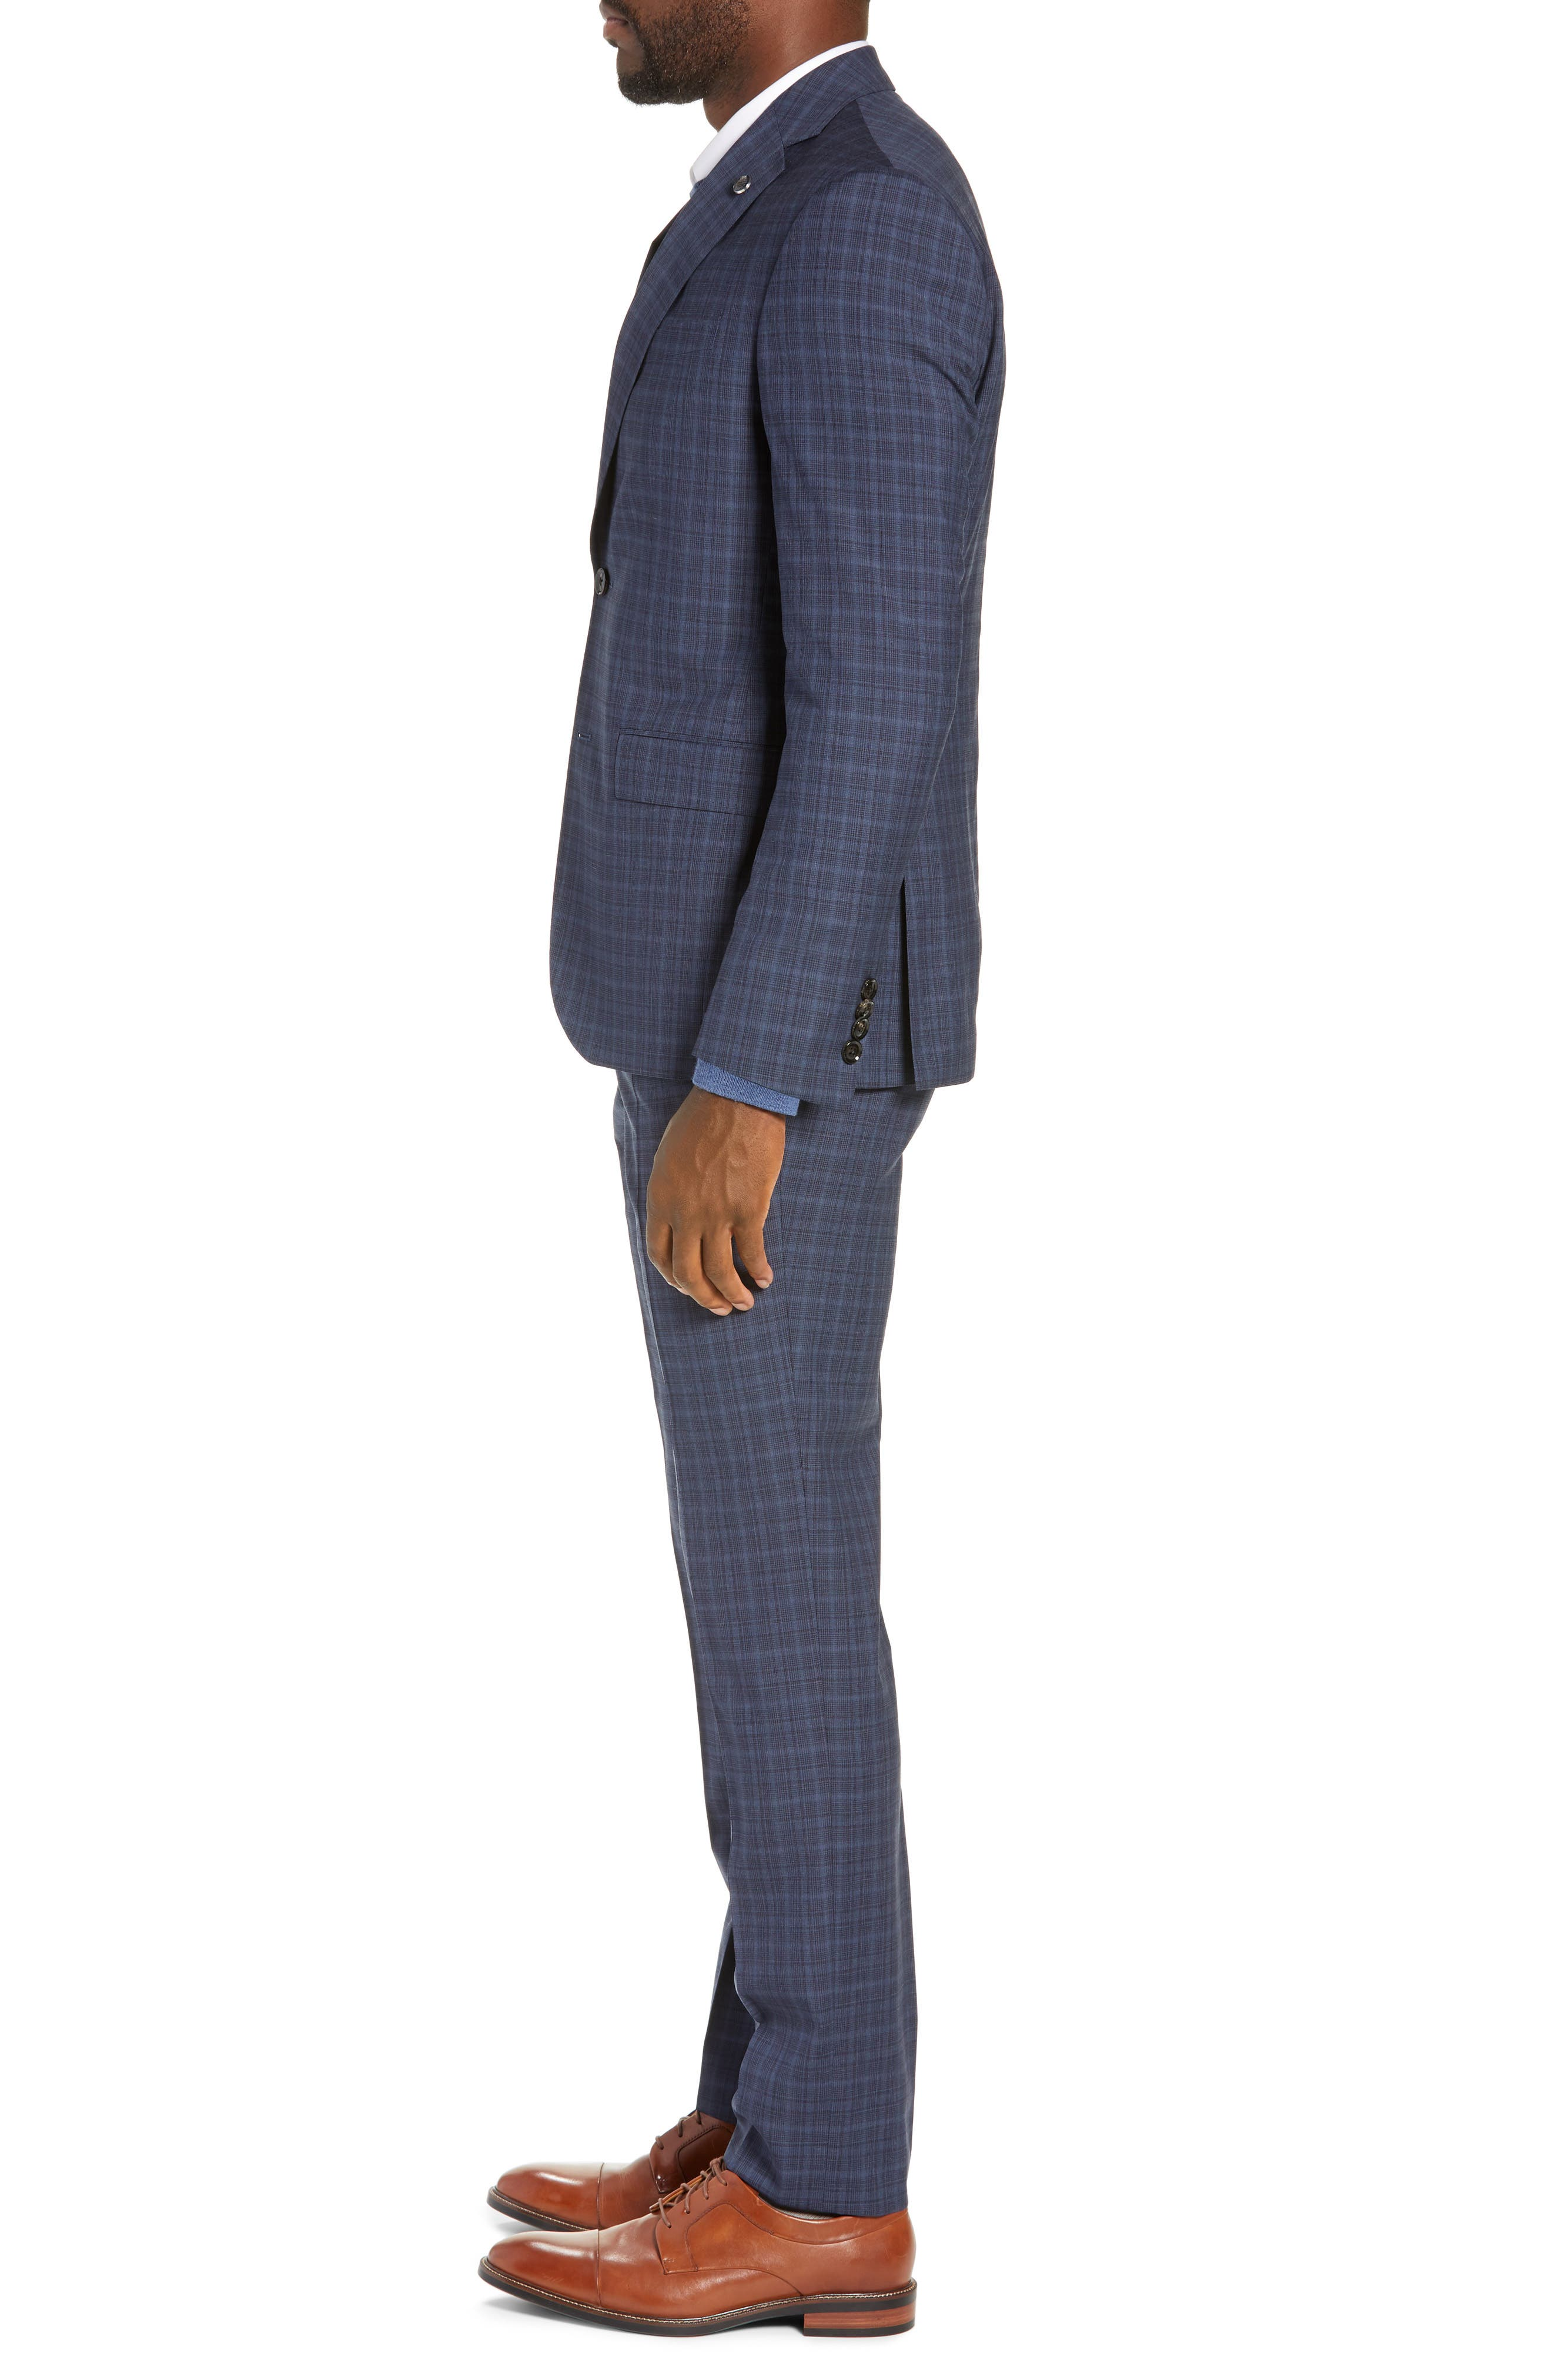 TED BAKER LONDON,                             Roger Slim Fit Plaid Wool Suit,                             Alternate thumbnail 3, color,                             GREY